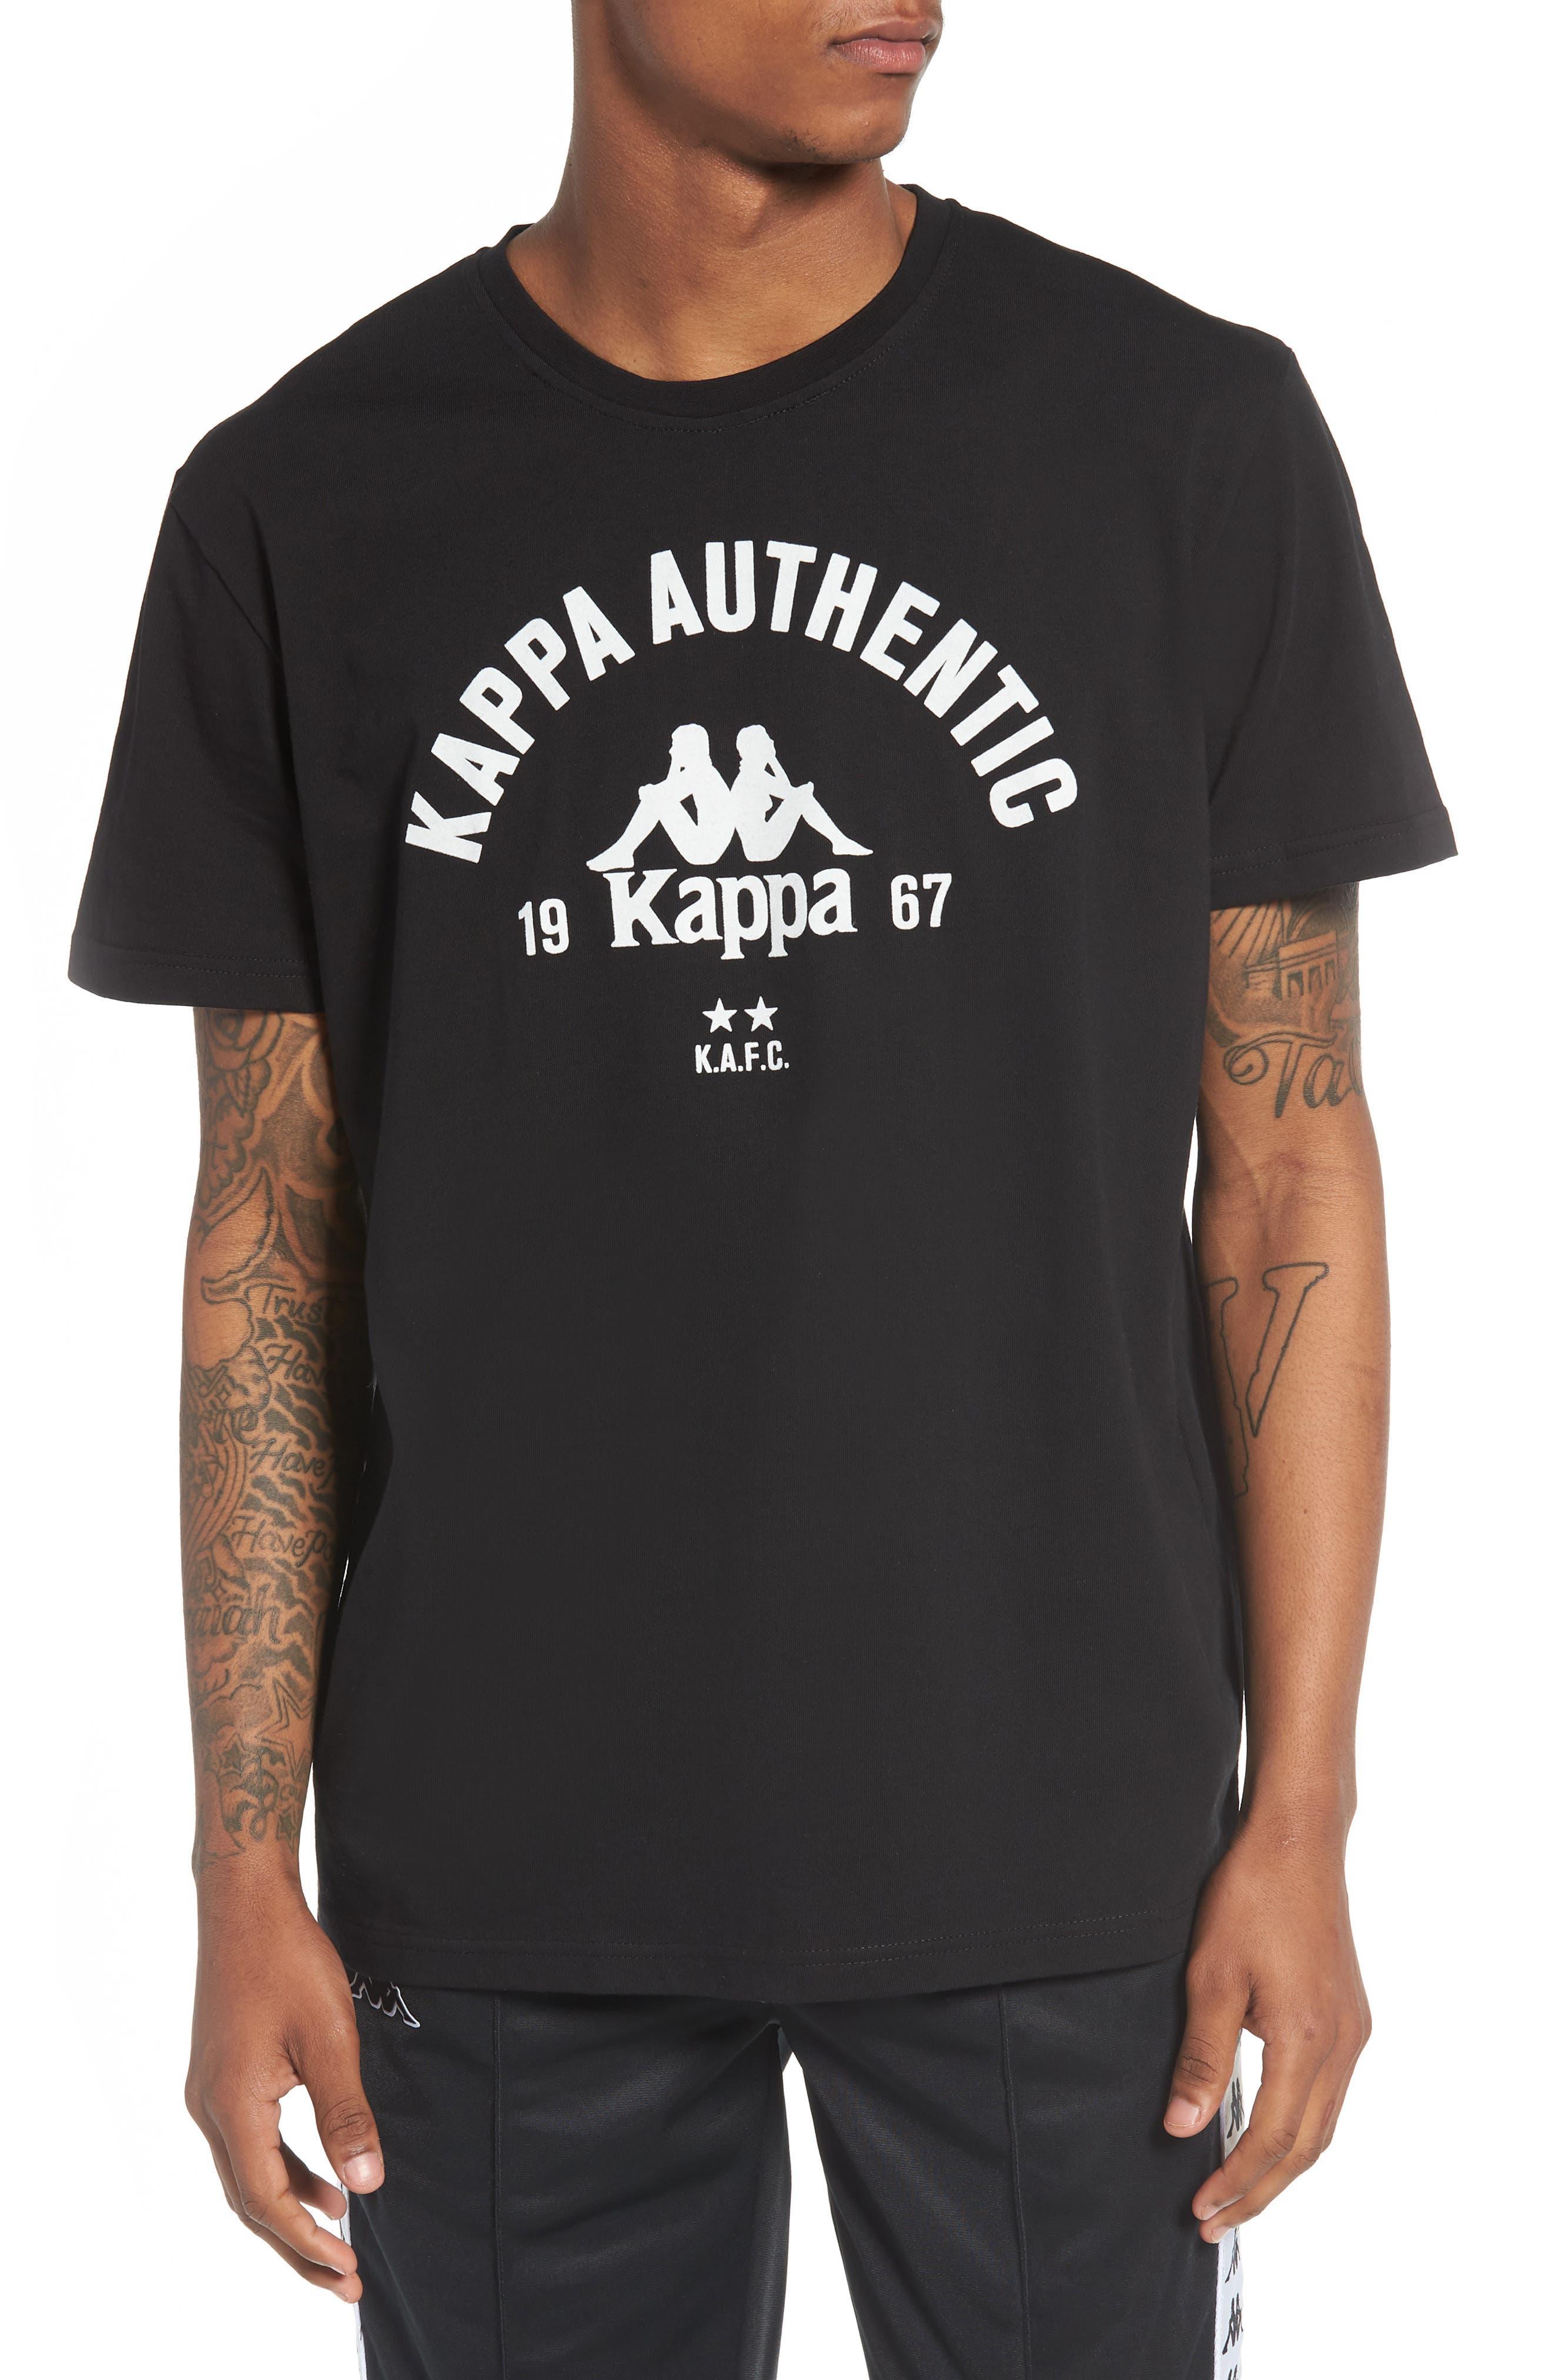 Kappa Authentic Graphic T-Shirt